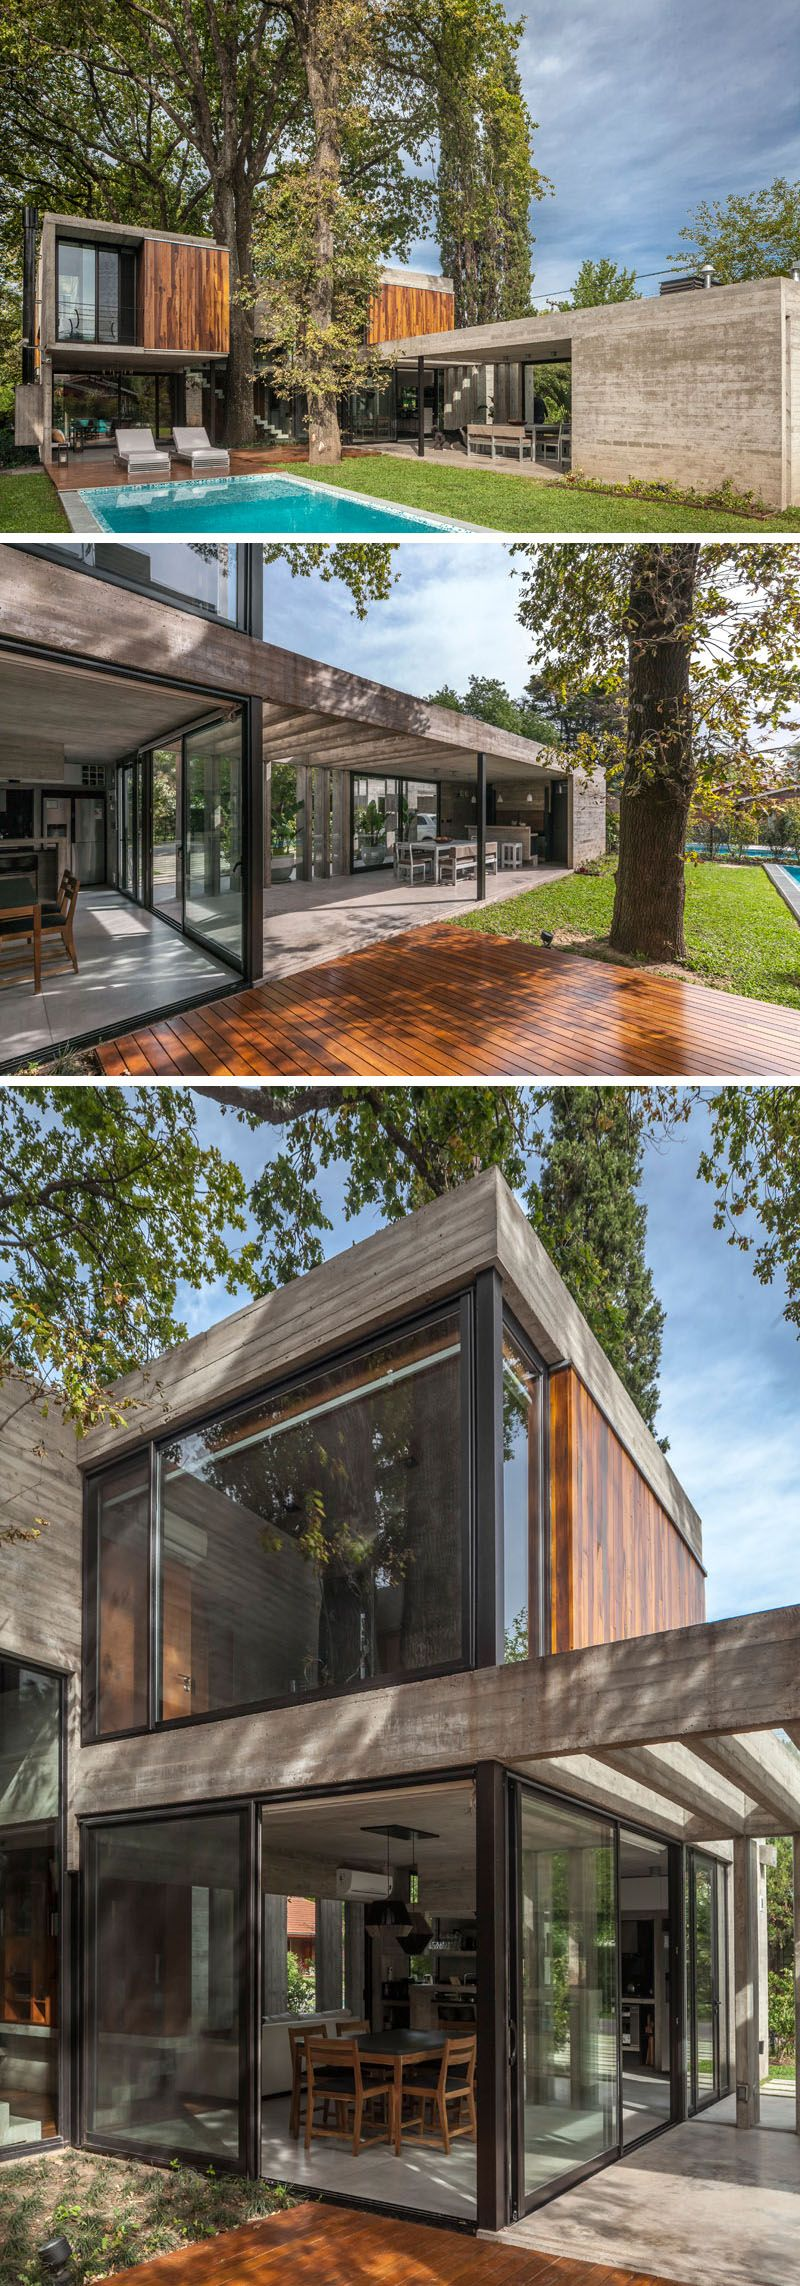 Besonias Almeida Arquitectos Have Designed A New Concrete And Wood ...